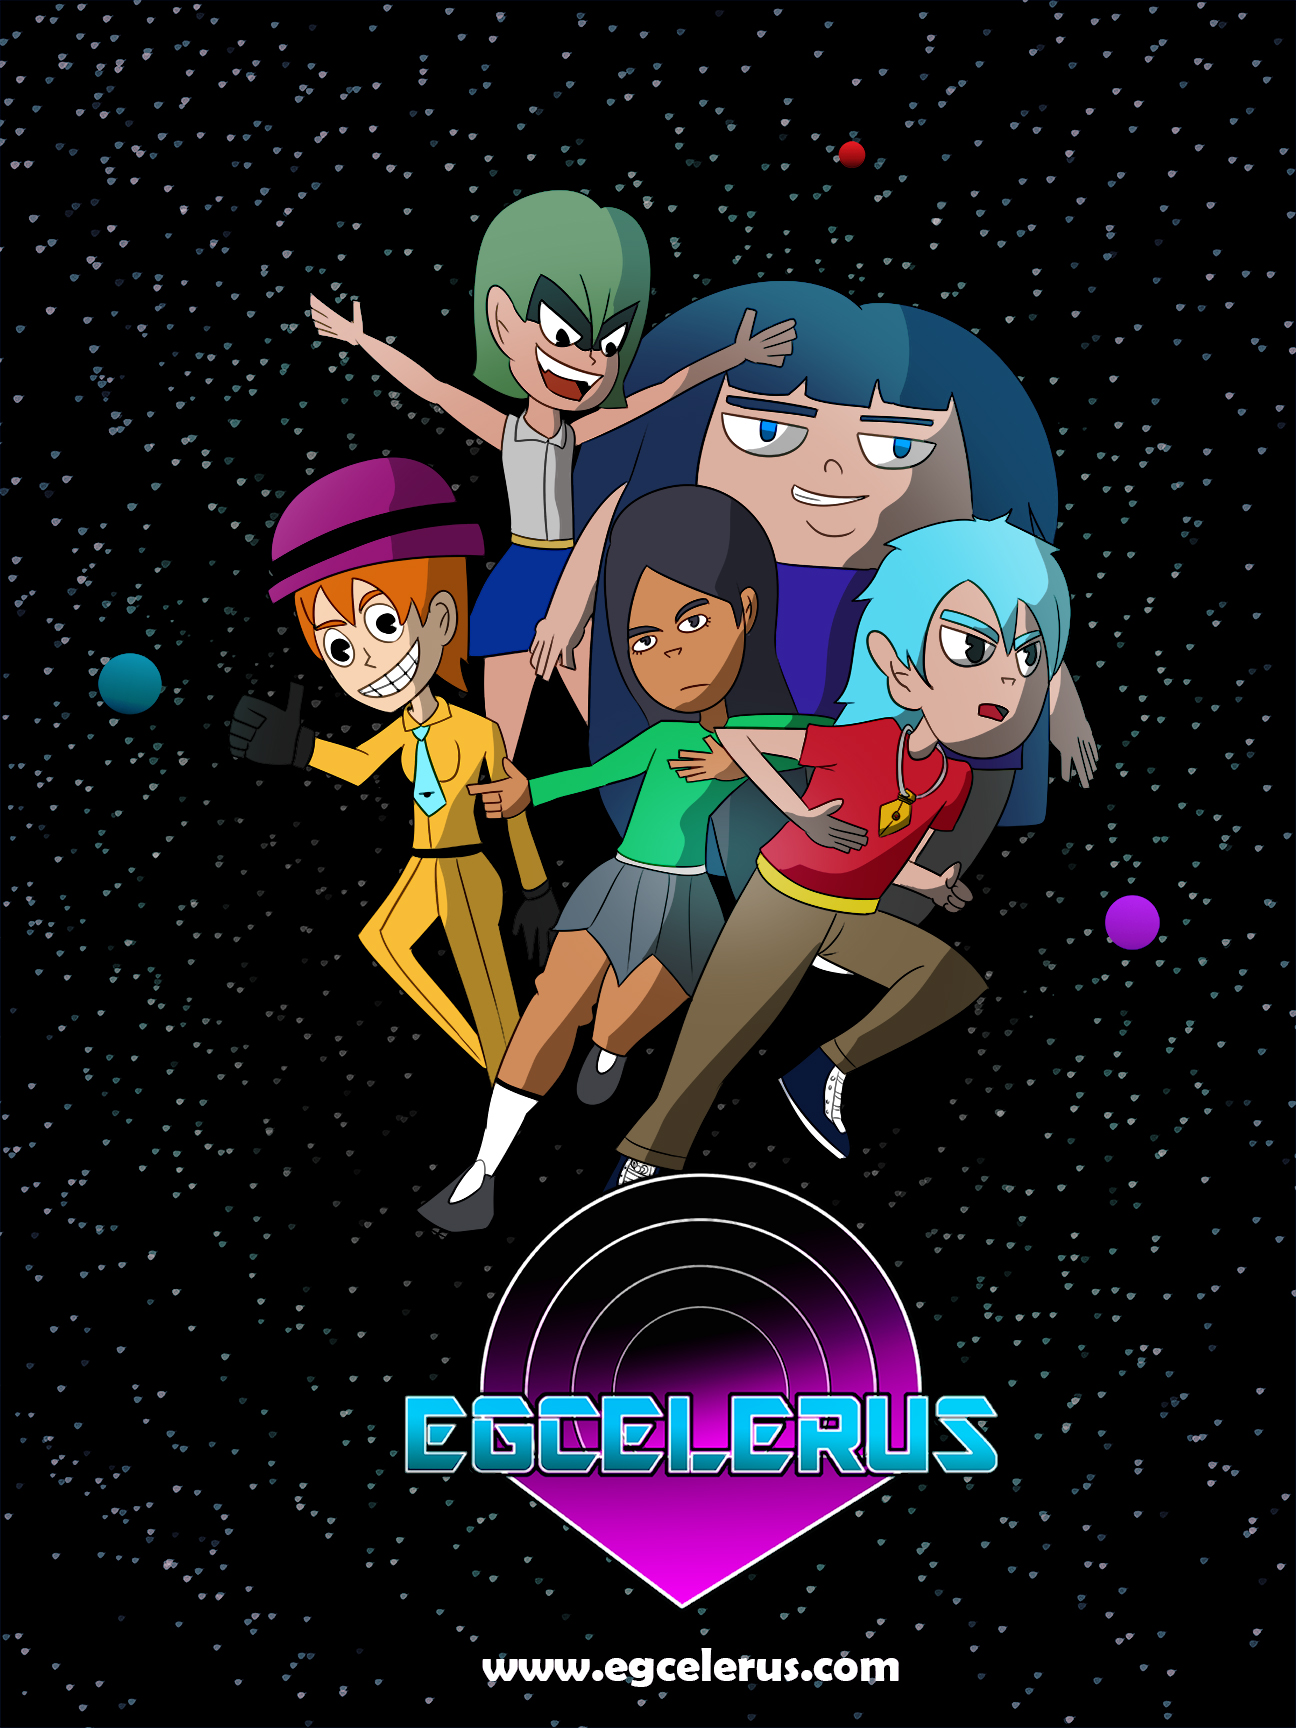 Egcelerus